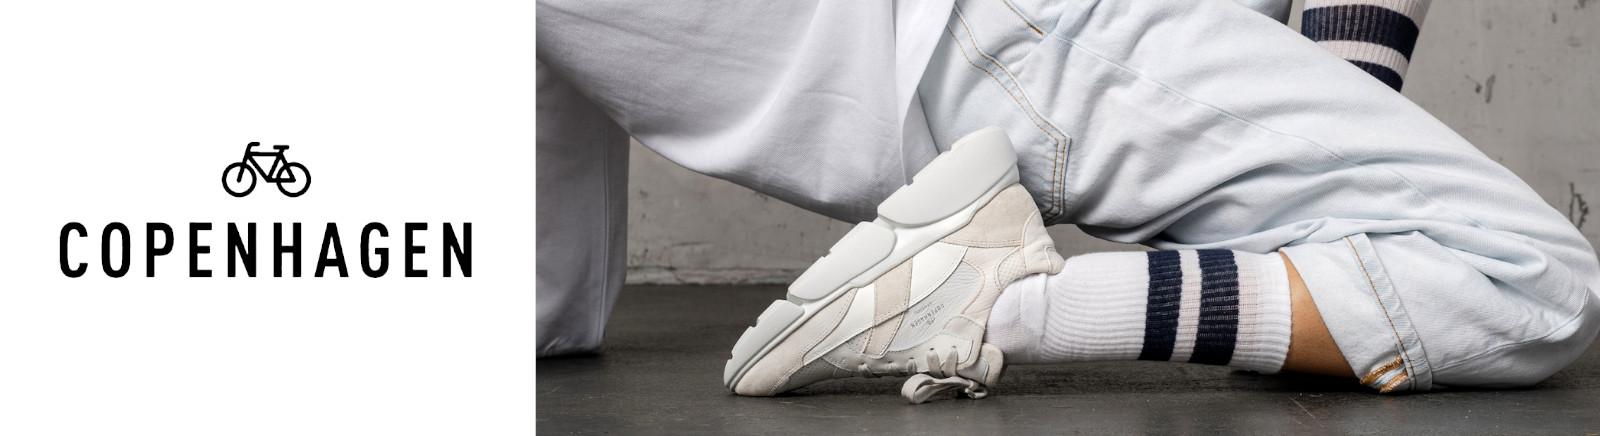 Copenhagen Herrenschuhe online bestellen im Prange Schuhe Shop